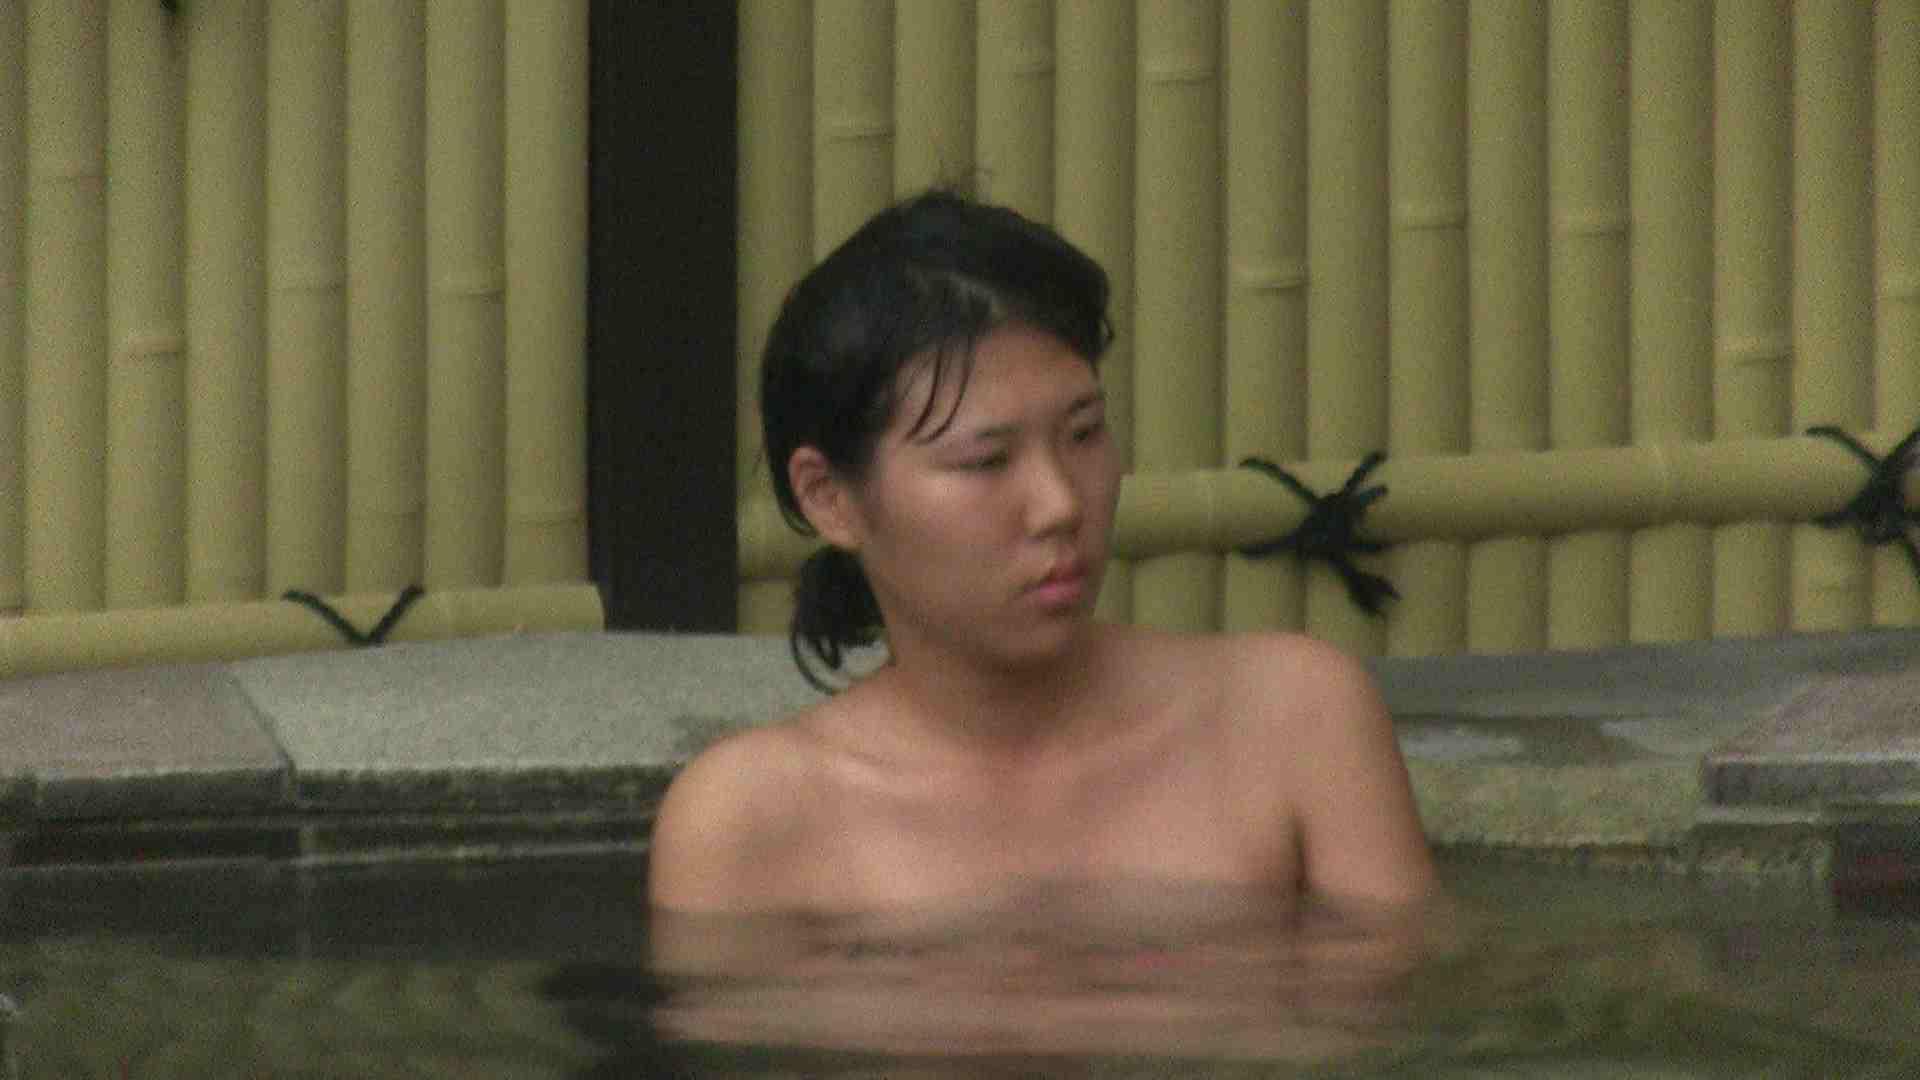 Aquaな露天風呂Vol.215 盗撮 おまんこ無修正動画無料 106枚 98